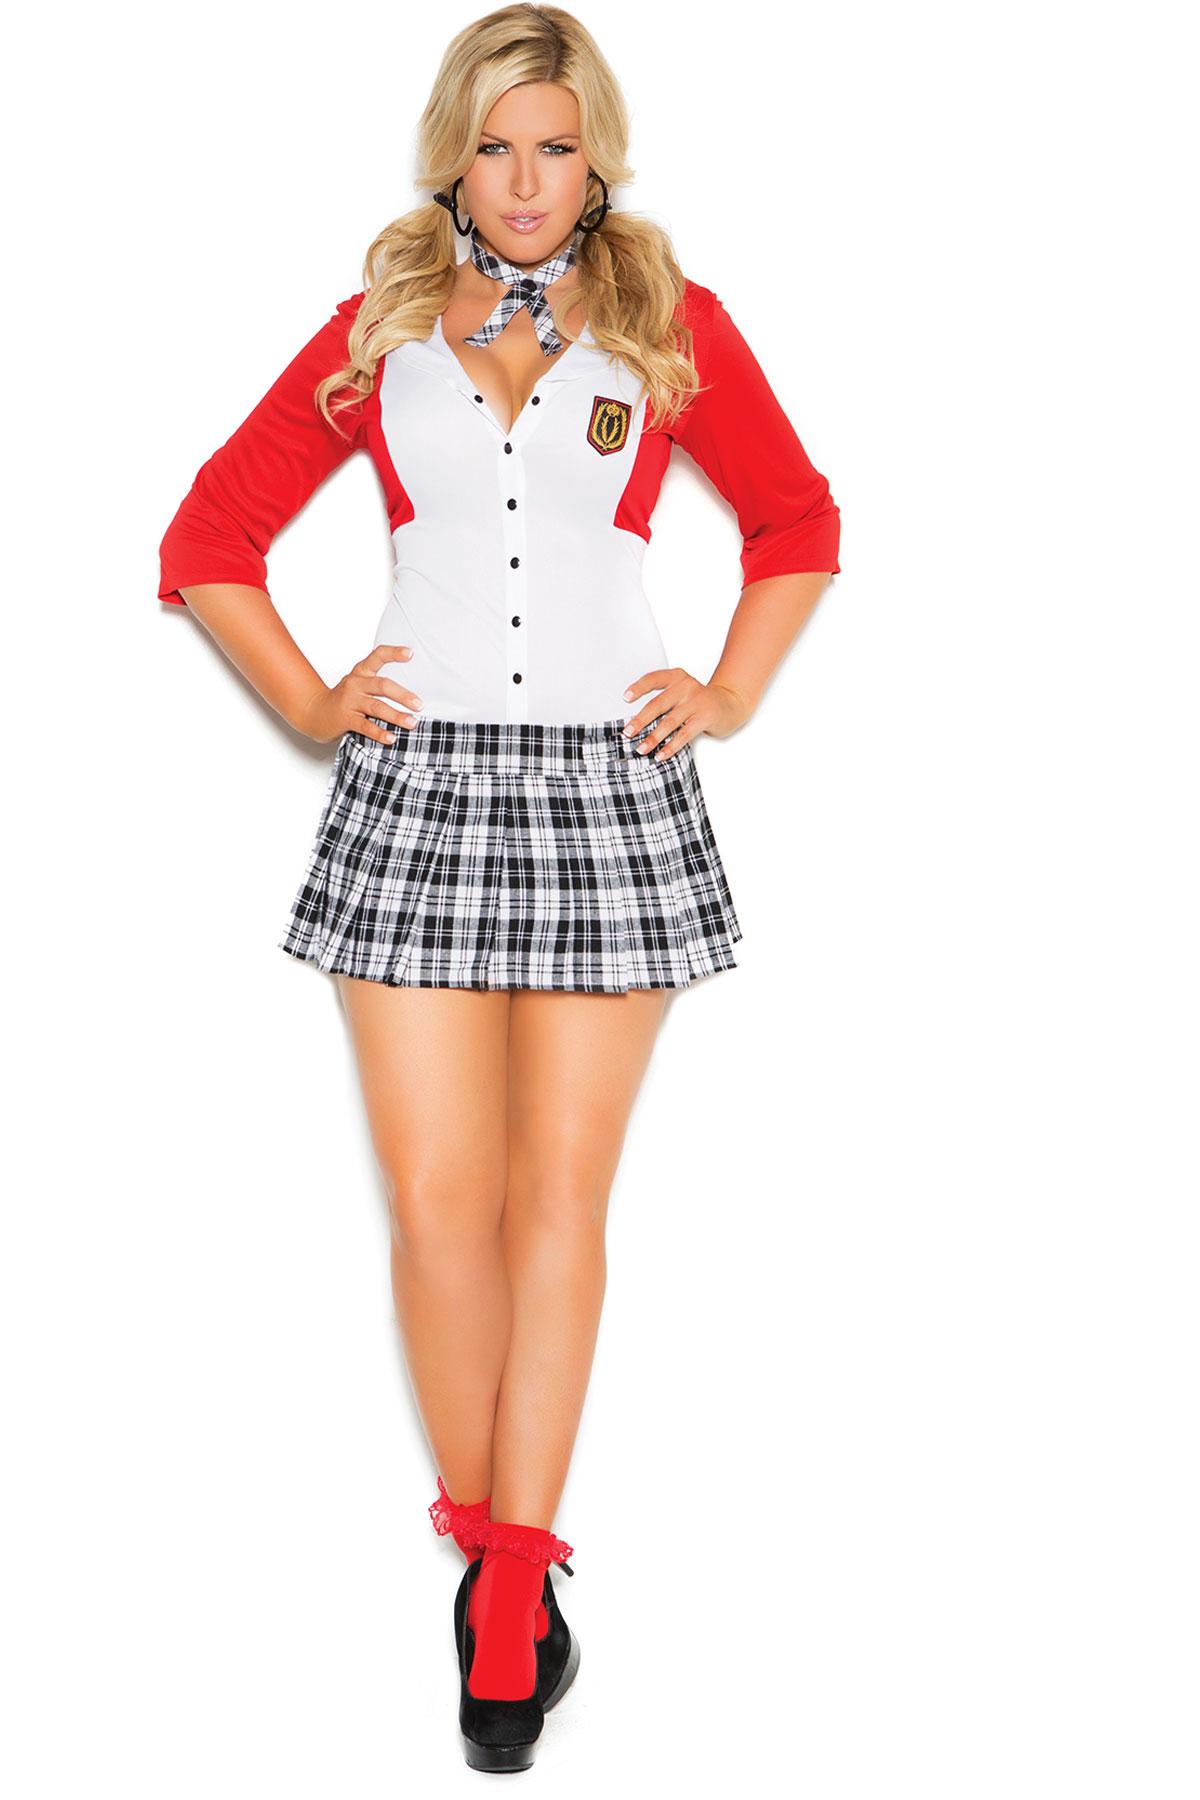 Dean List Diva Dress Attached Jacket Neck Piece Costume Adult Women